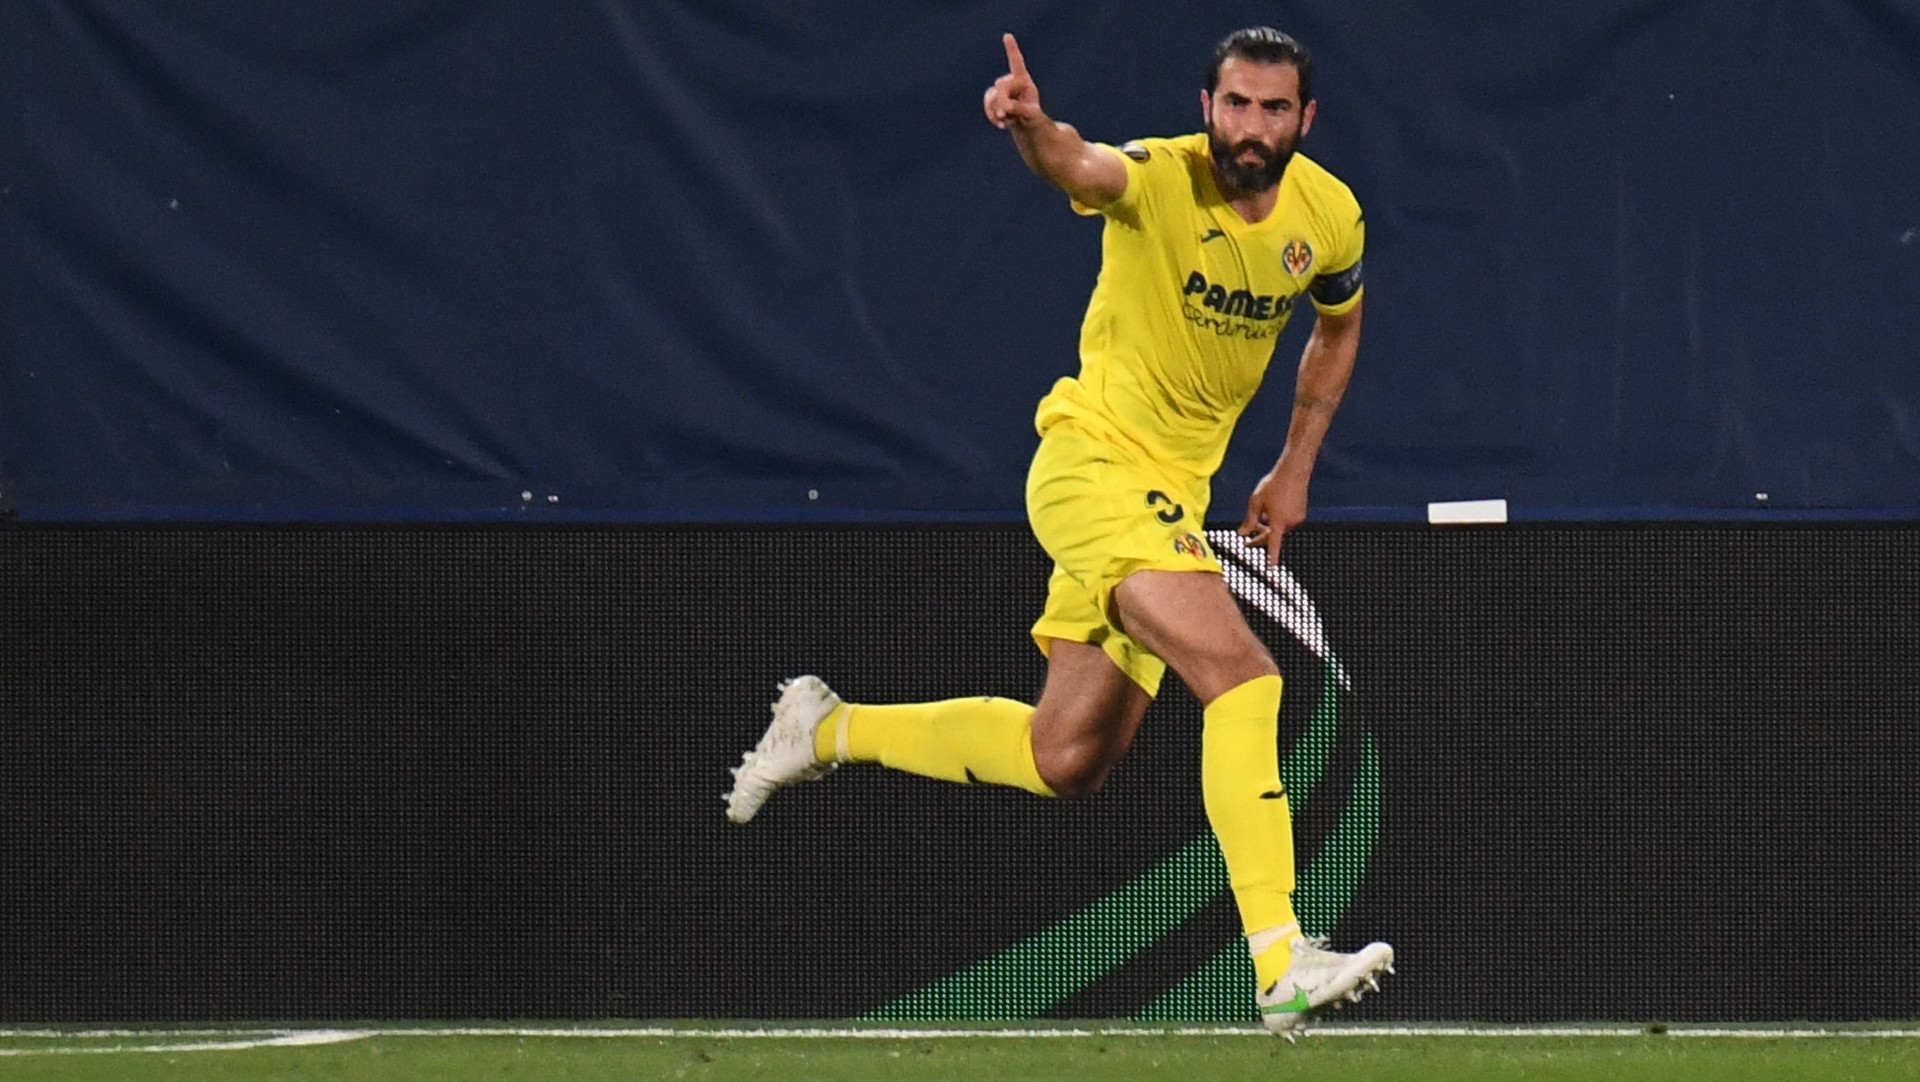 Smith Rowe of Arteta's bet backfires but Pepe gives Arsenal crucial Europa League lifeline